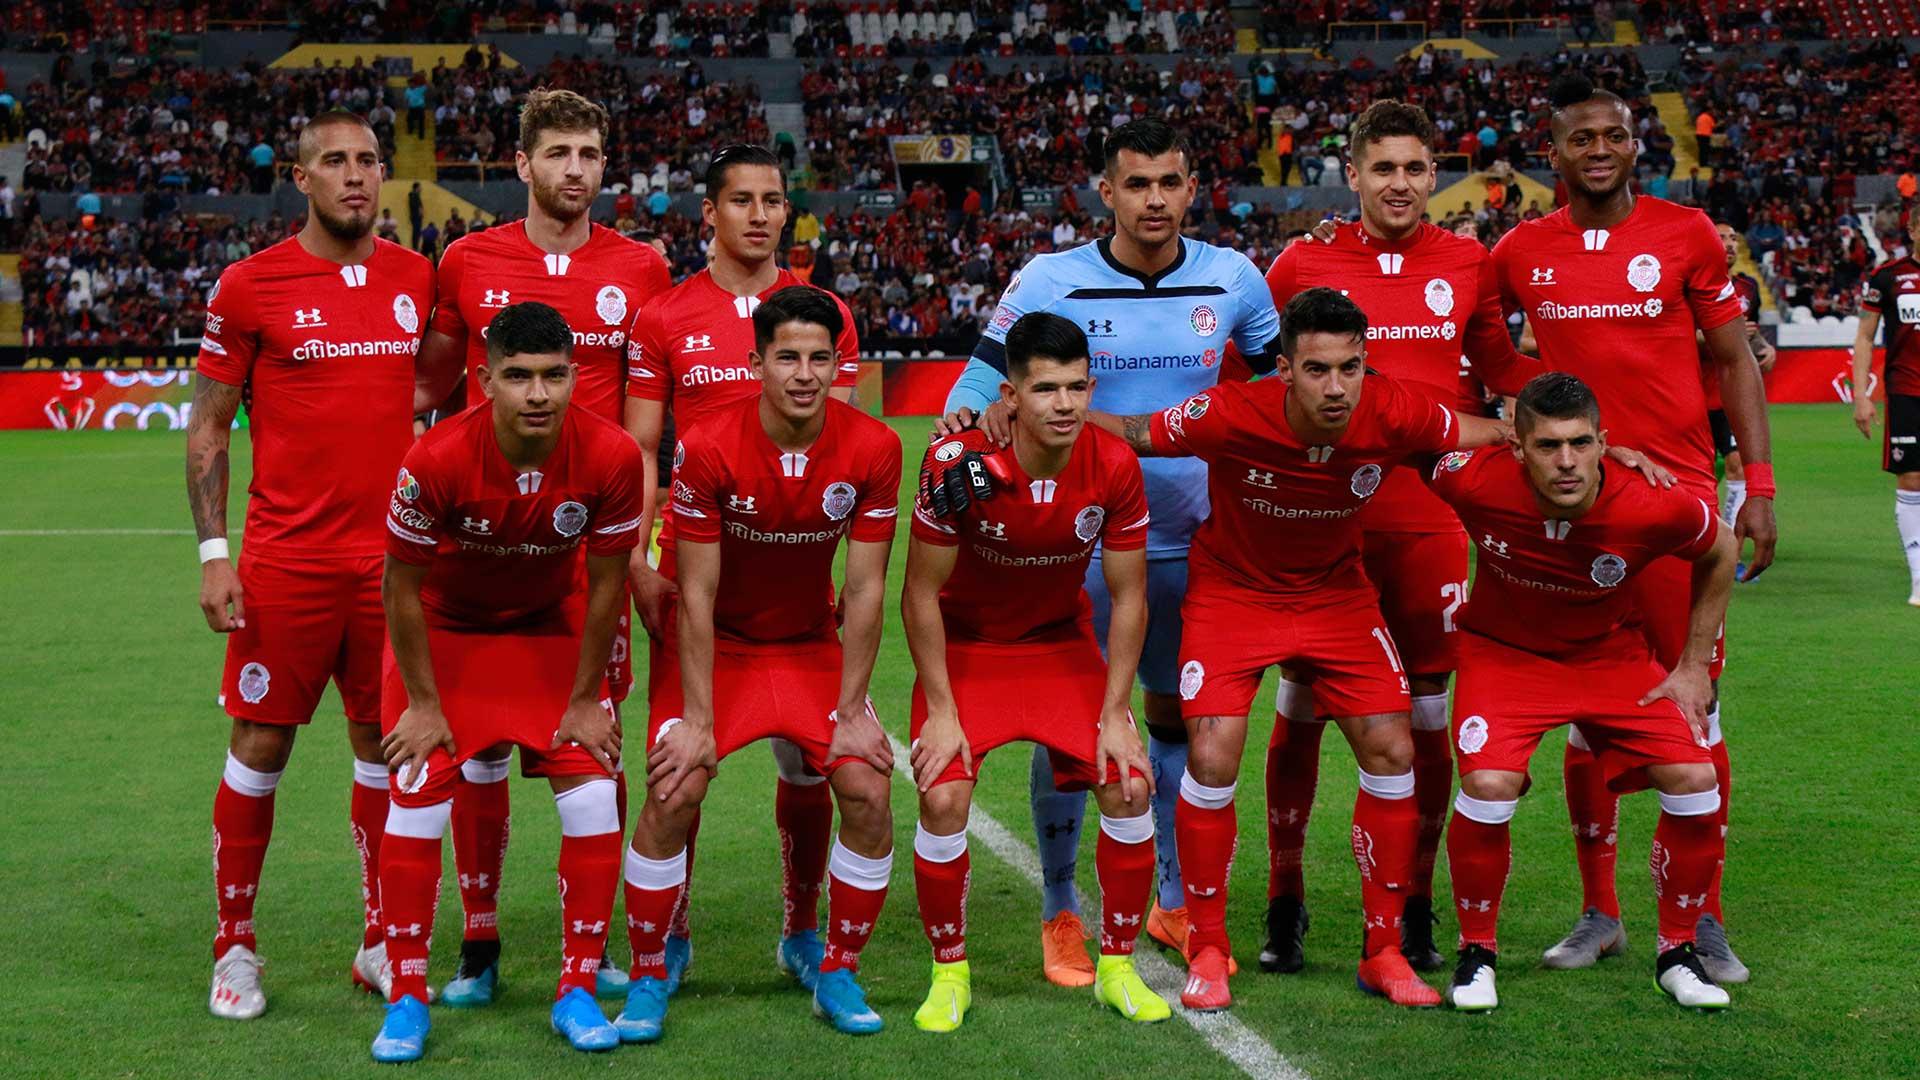 Toluca FC vs Atlas Octavos de Final de la Copa MX